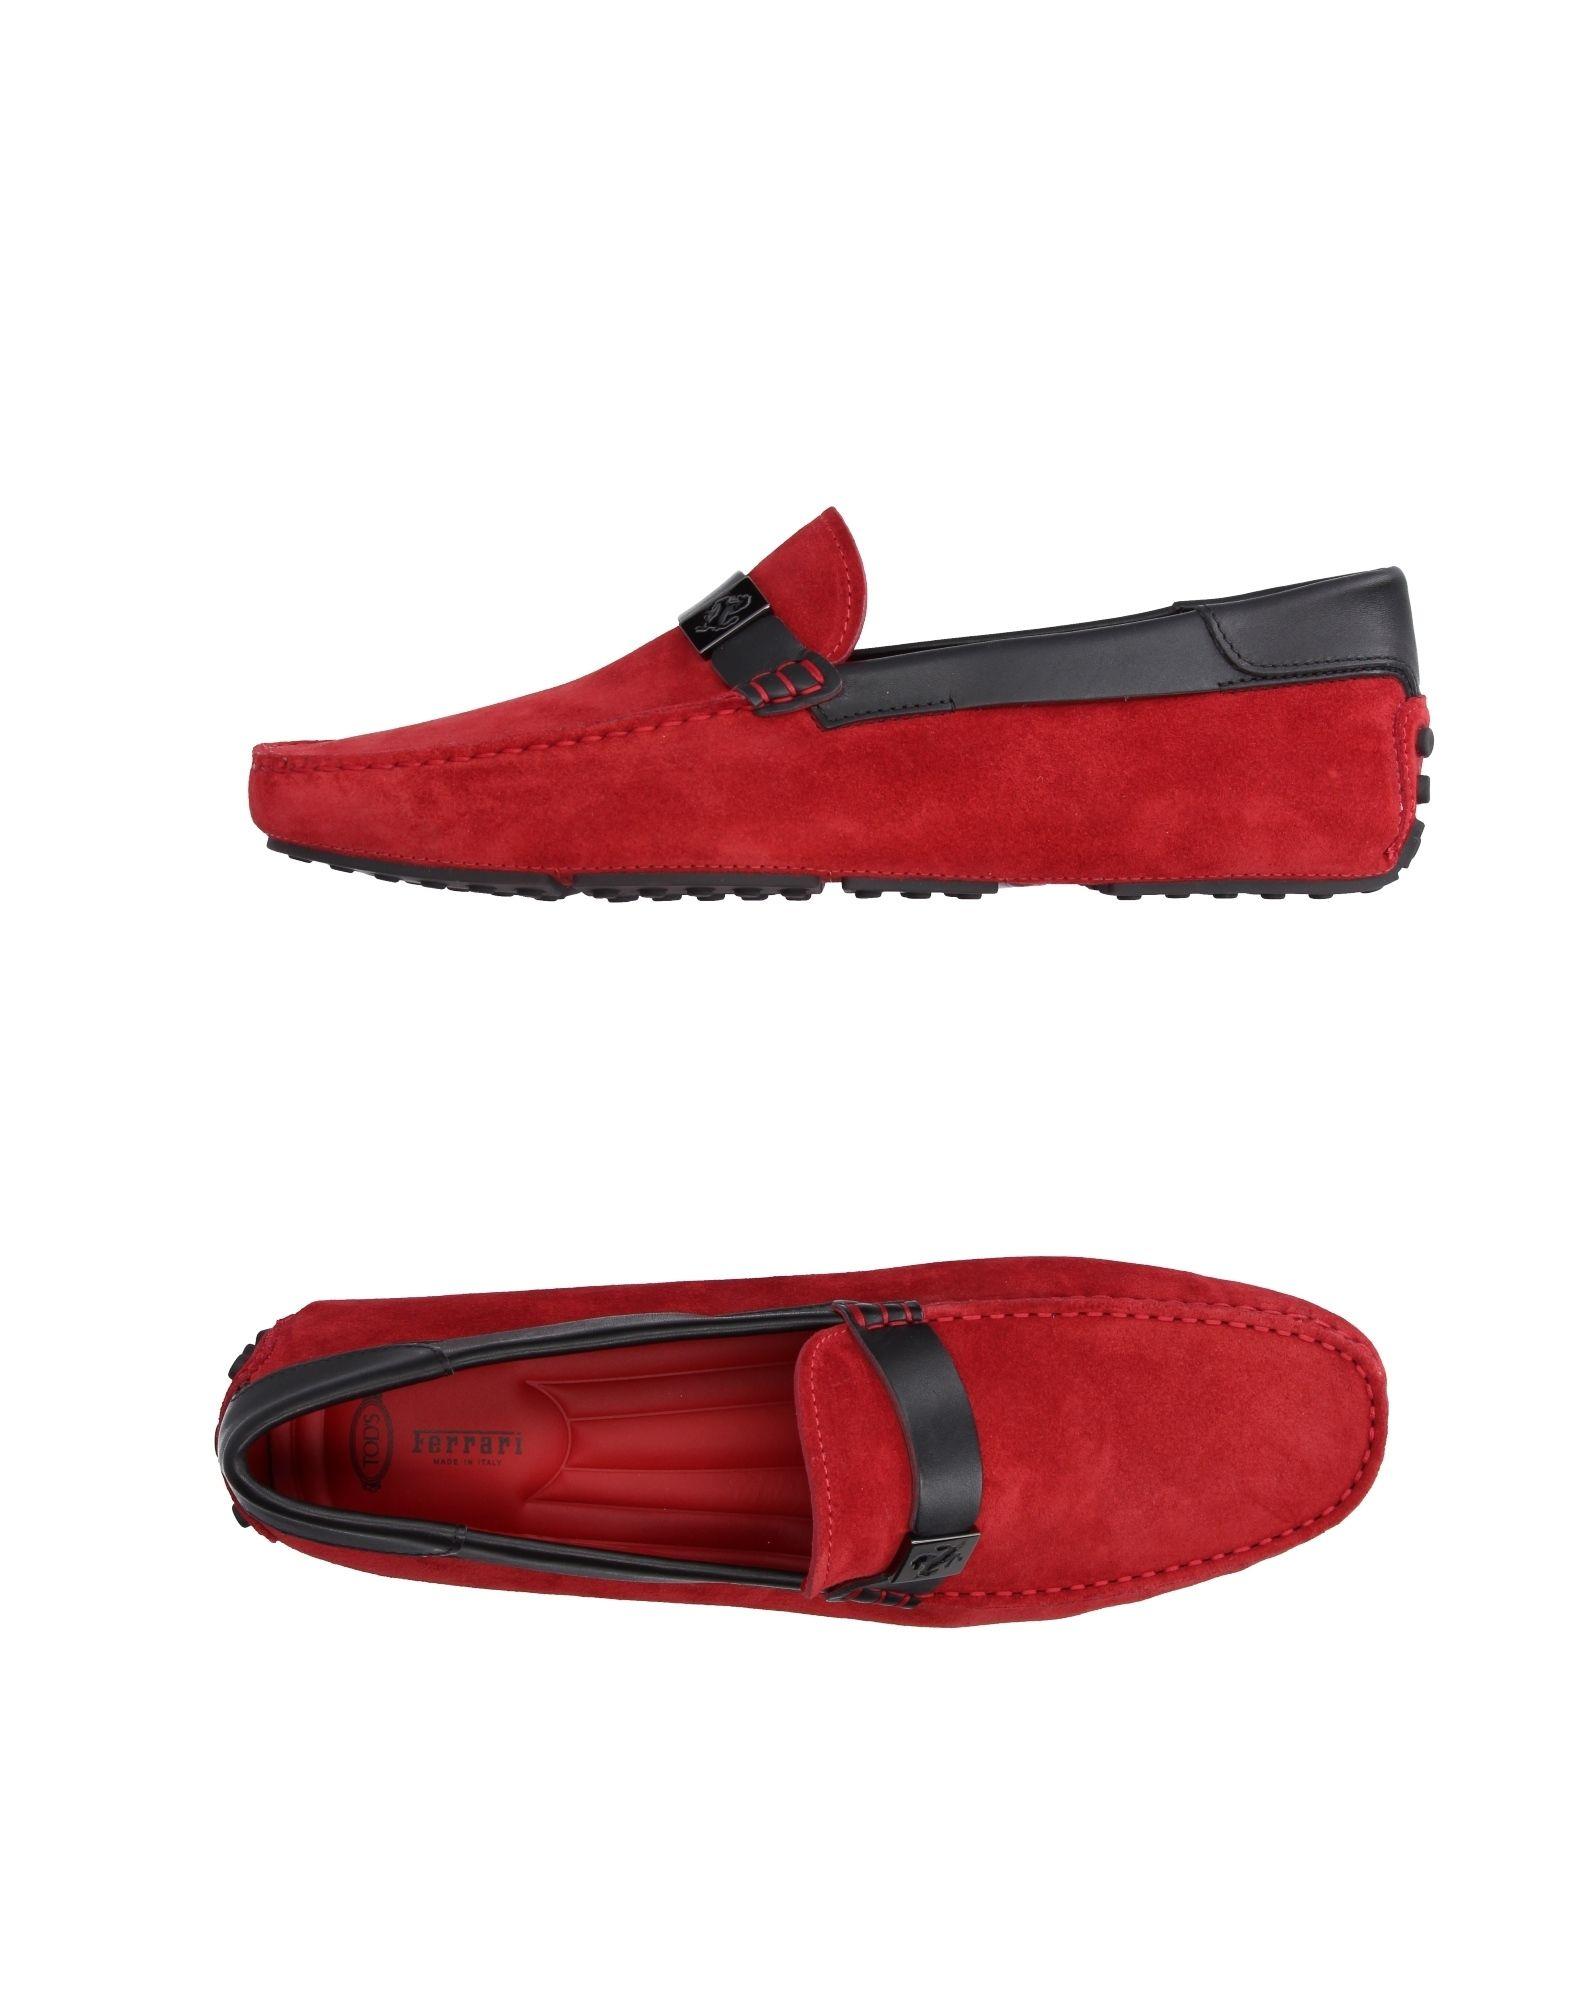 Tod's For Ferrari Mokassins Herren  11217798UJ Gute Qualität beliebte Schuhe